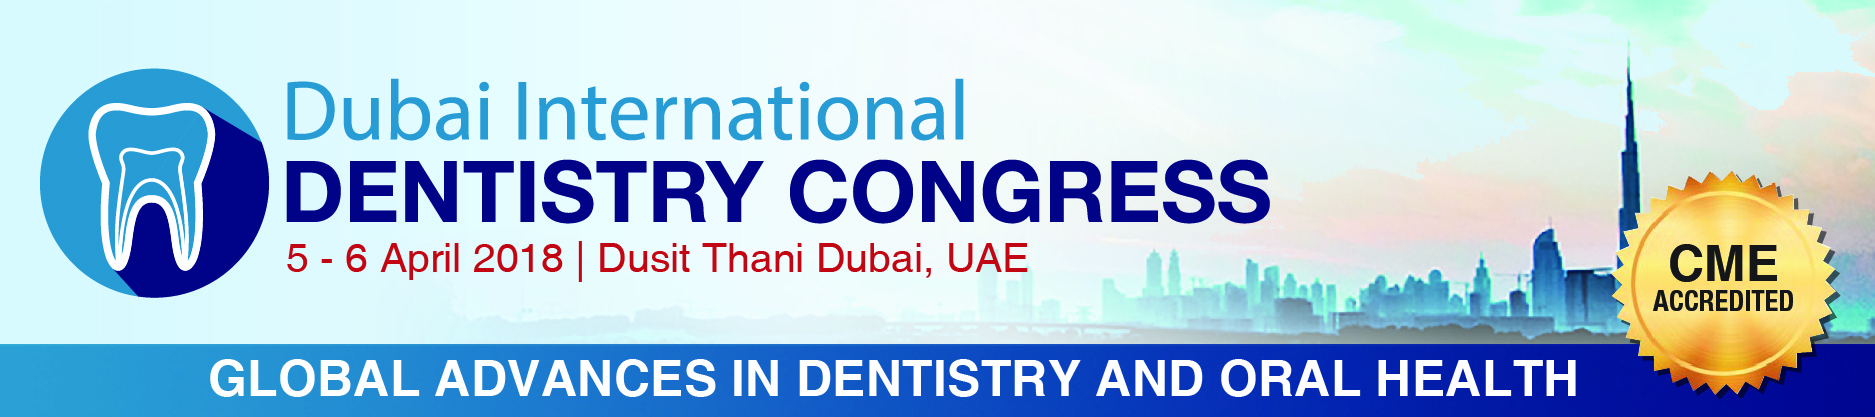 Dubai International Dentistry Congress